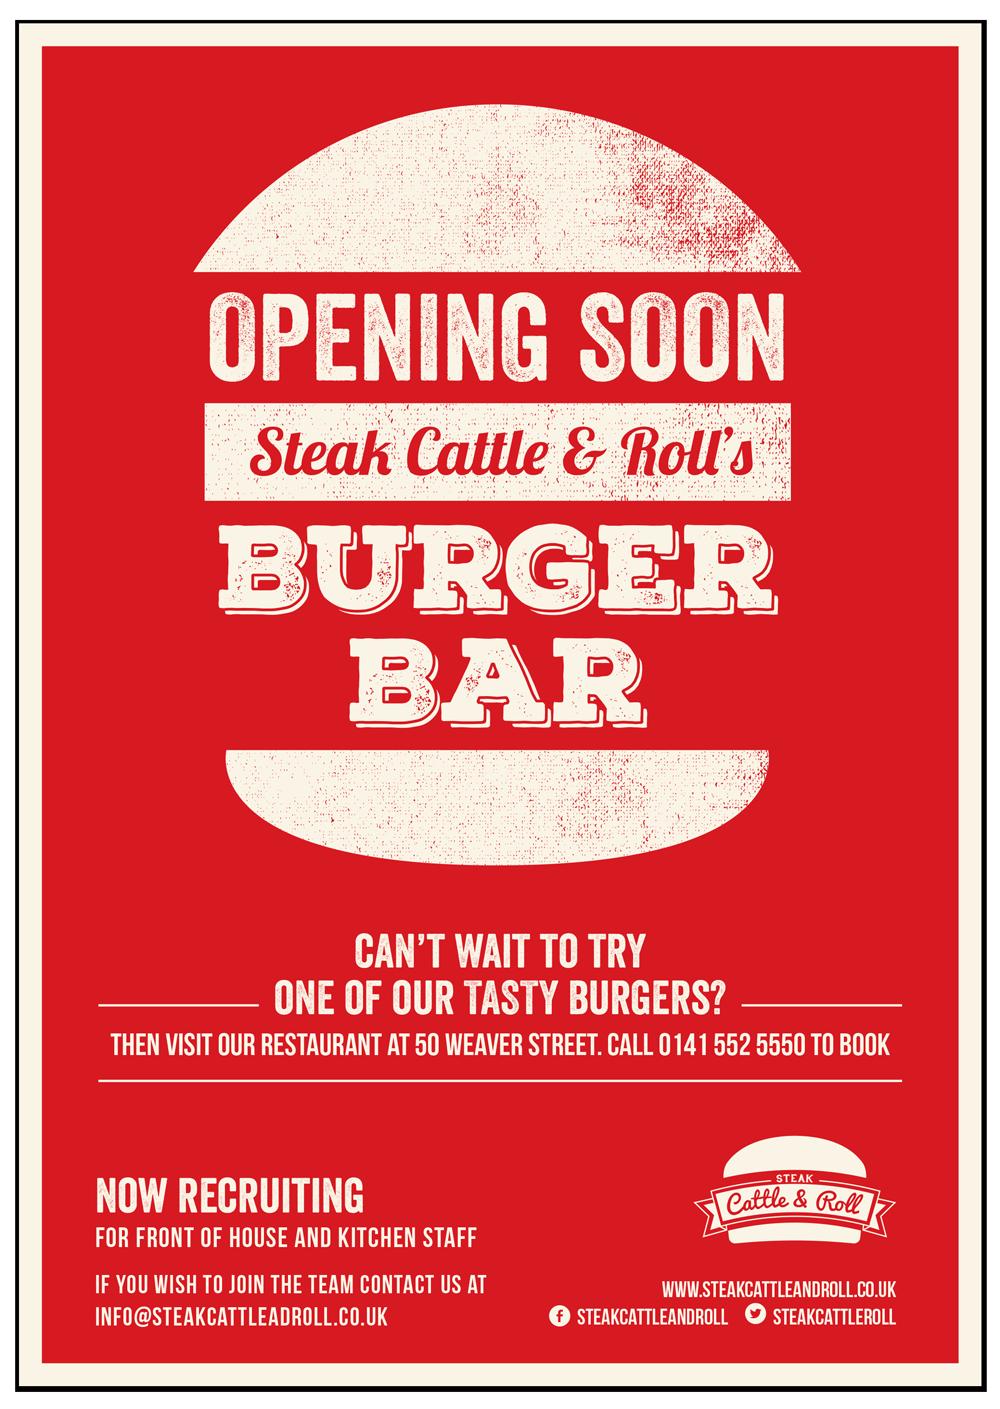 Steak, Cattle & Roll scr poster